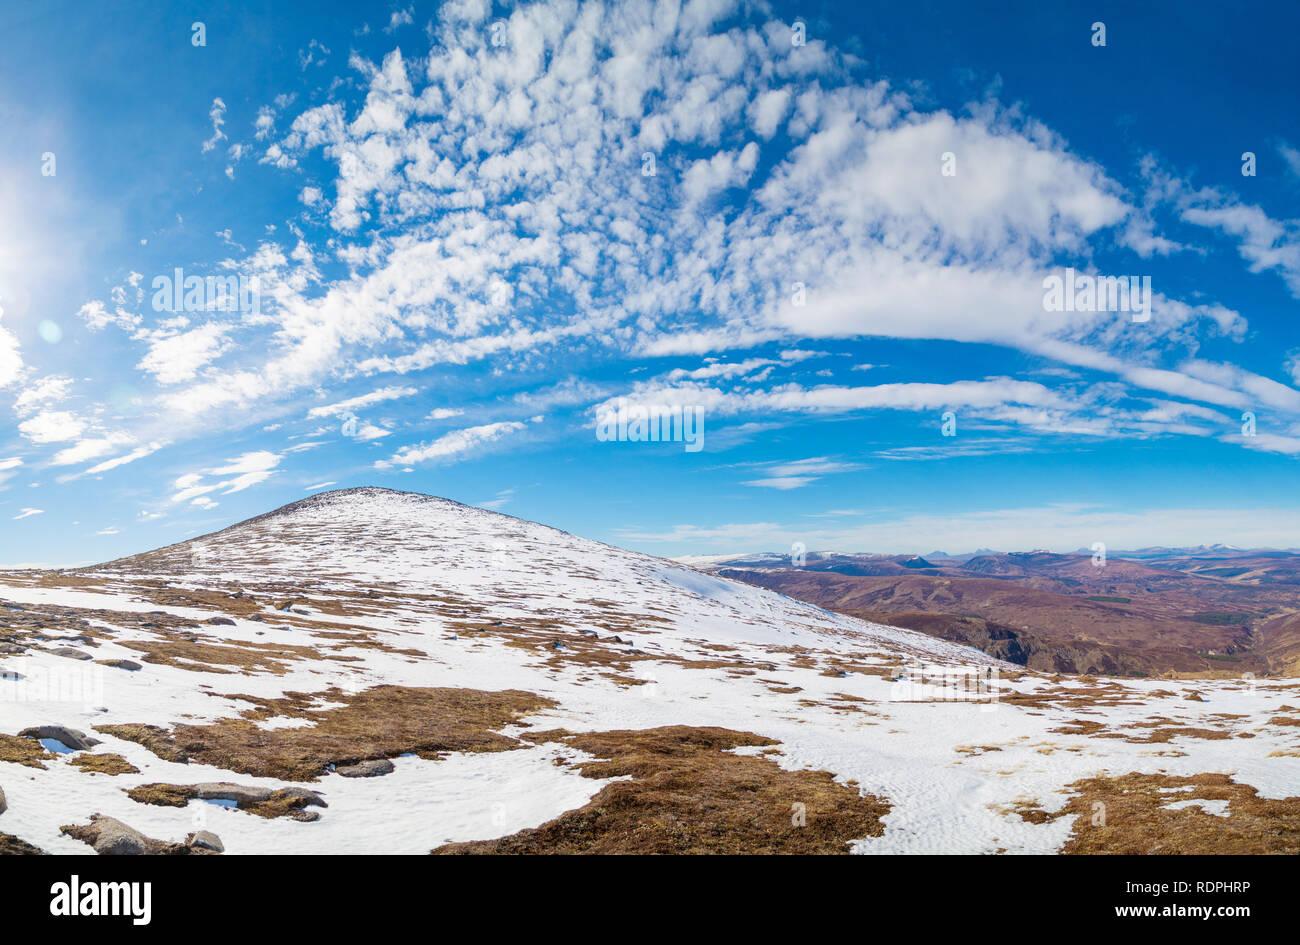 The summit of the Corbett Carn Chuinneag in Strath Carron, Ardgay - Stock Image